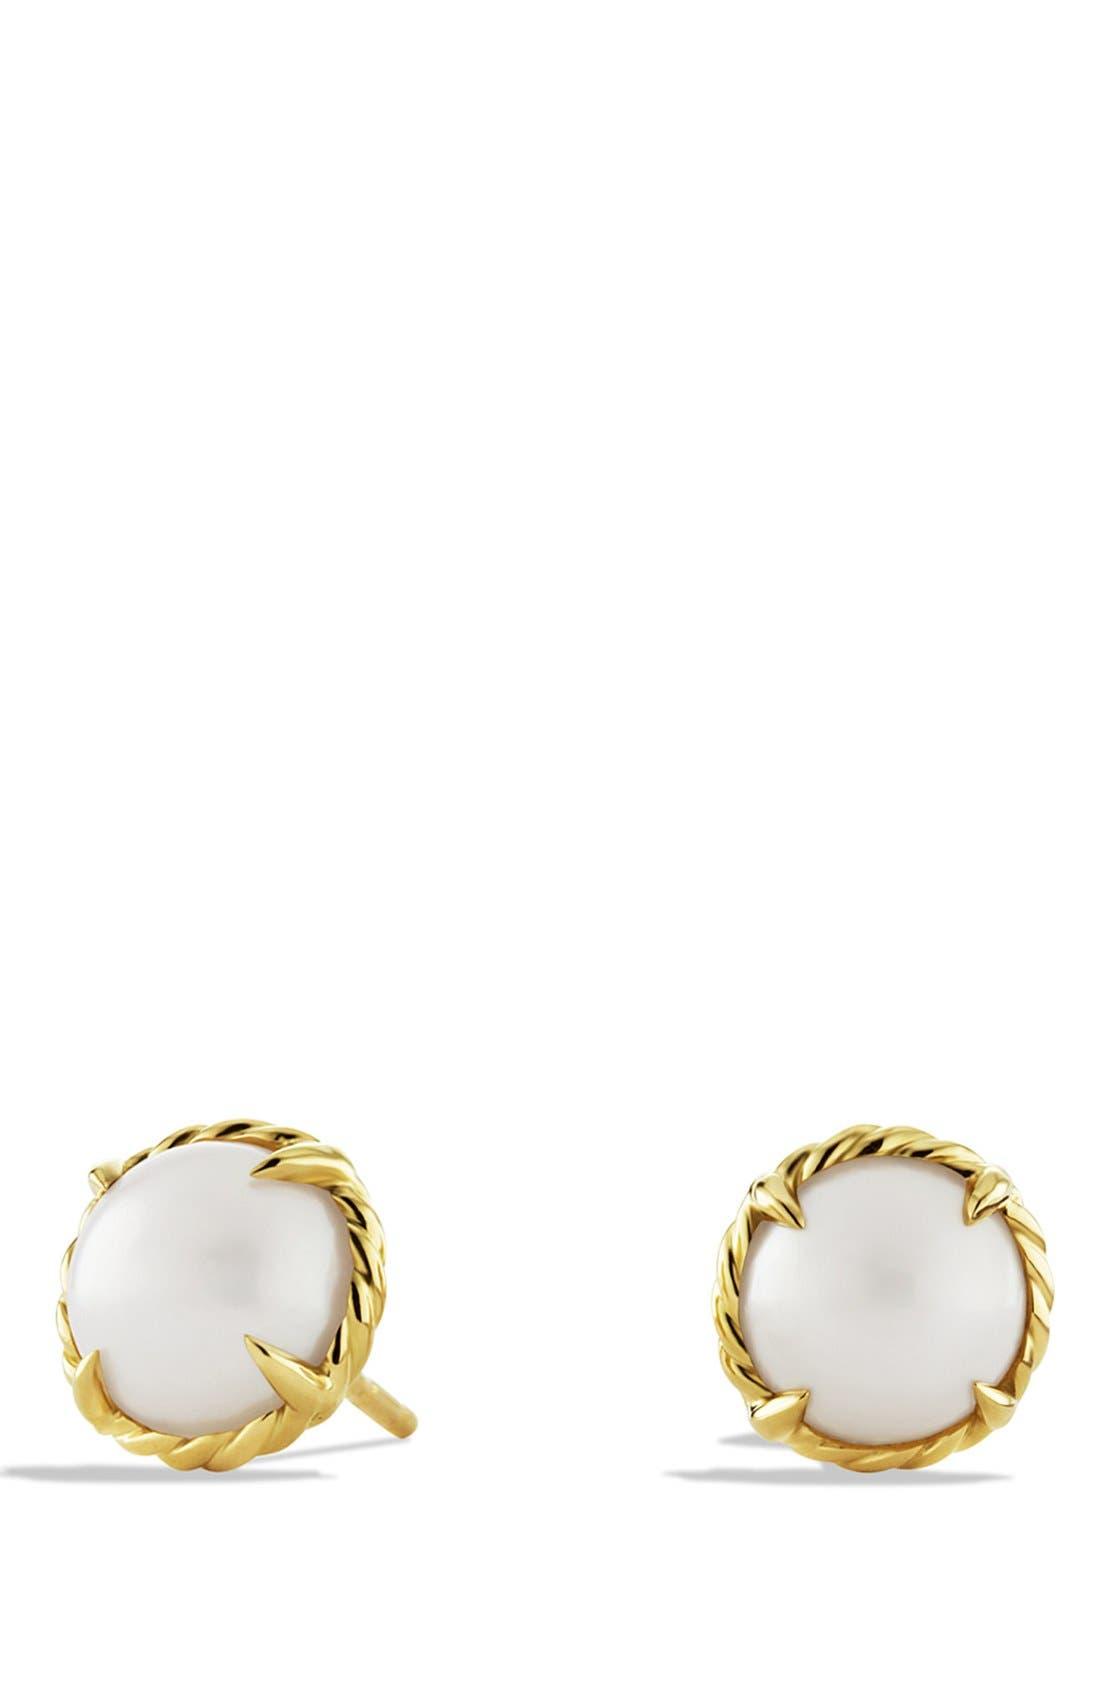 DAVID YURMAN 'Châtelaine' Earrings